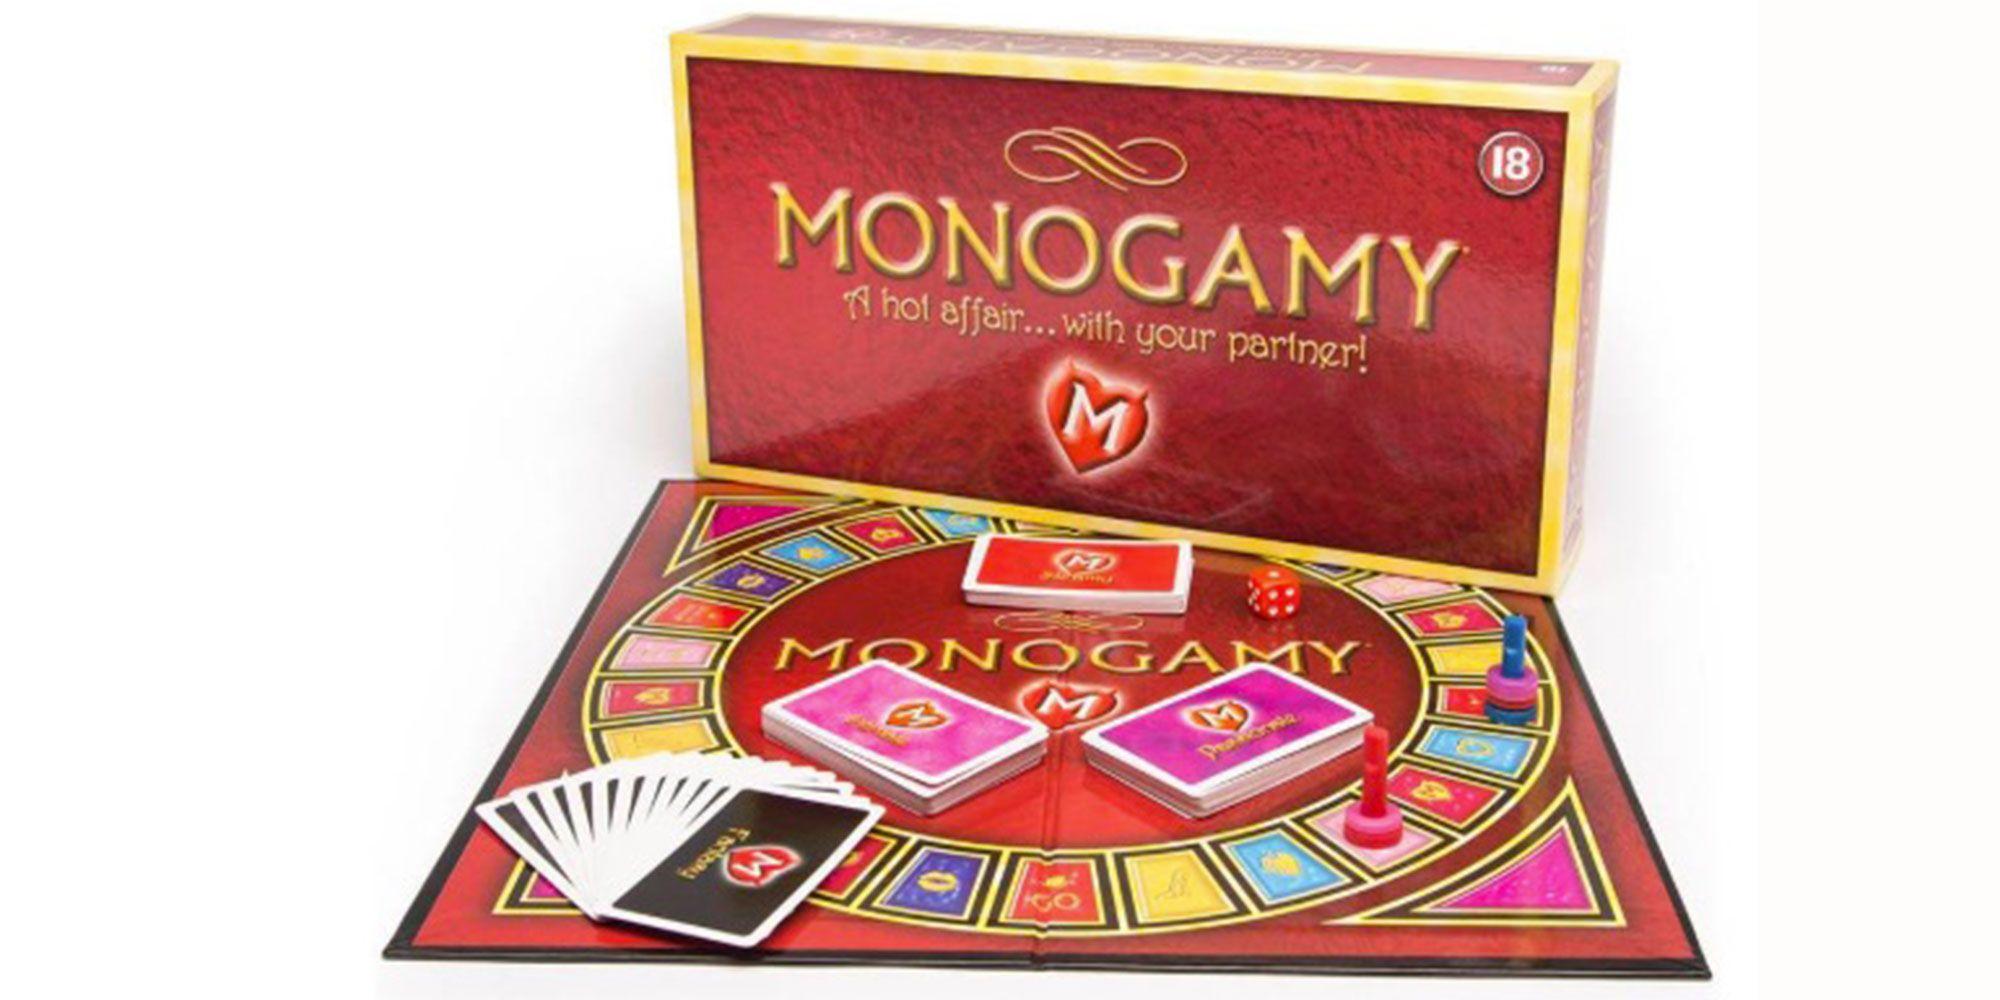 monogamy spel se porrfilm gratis